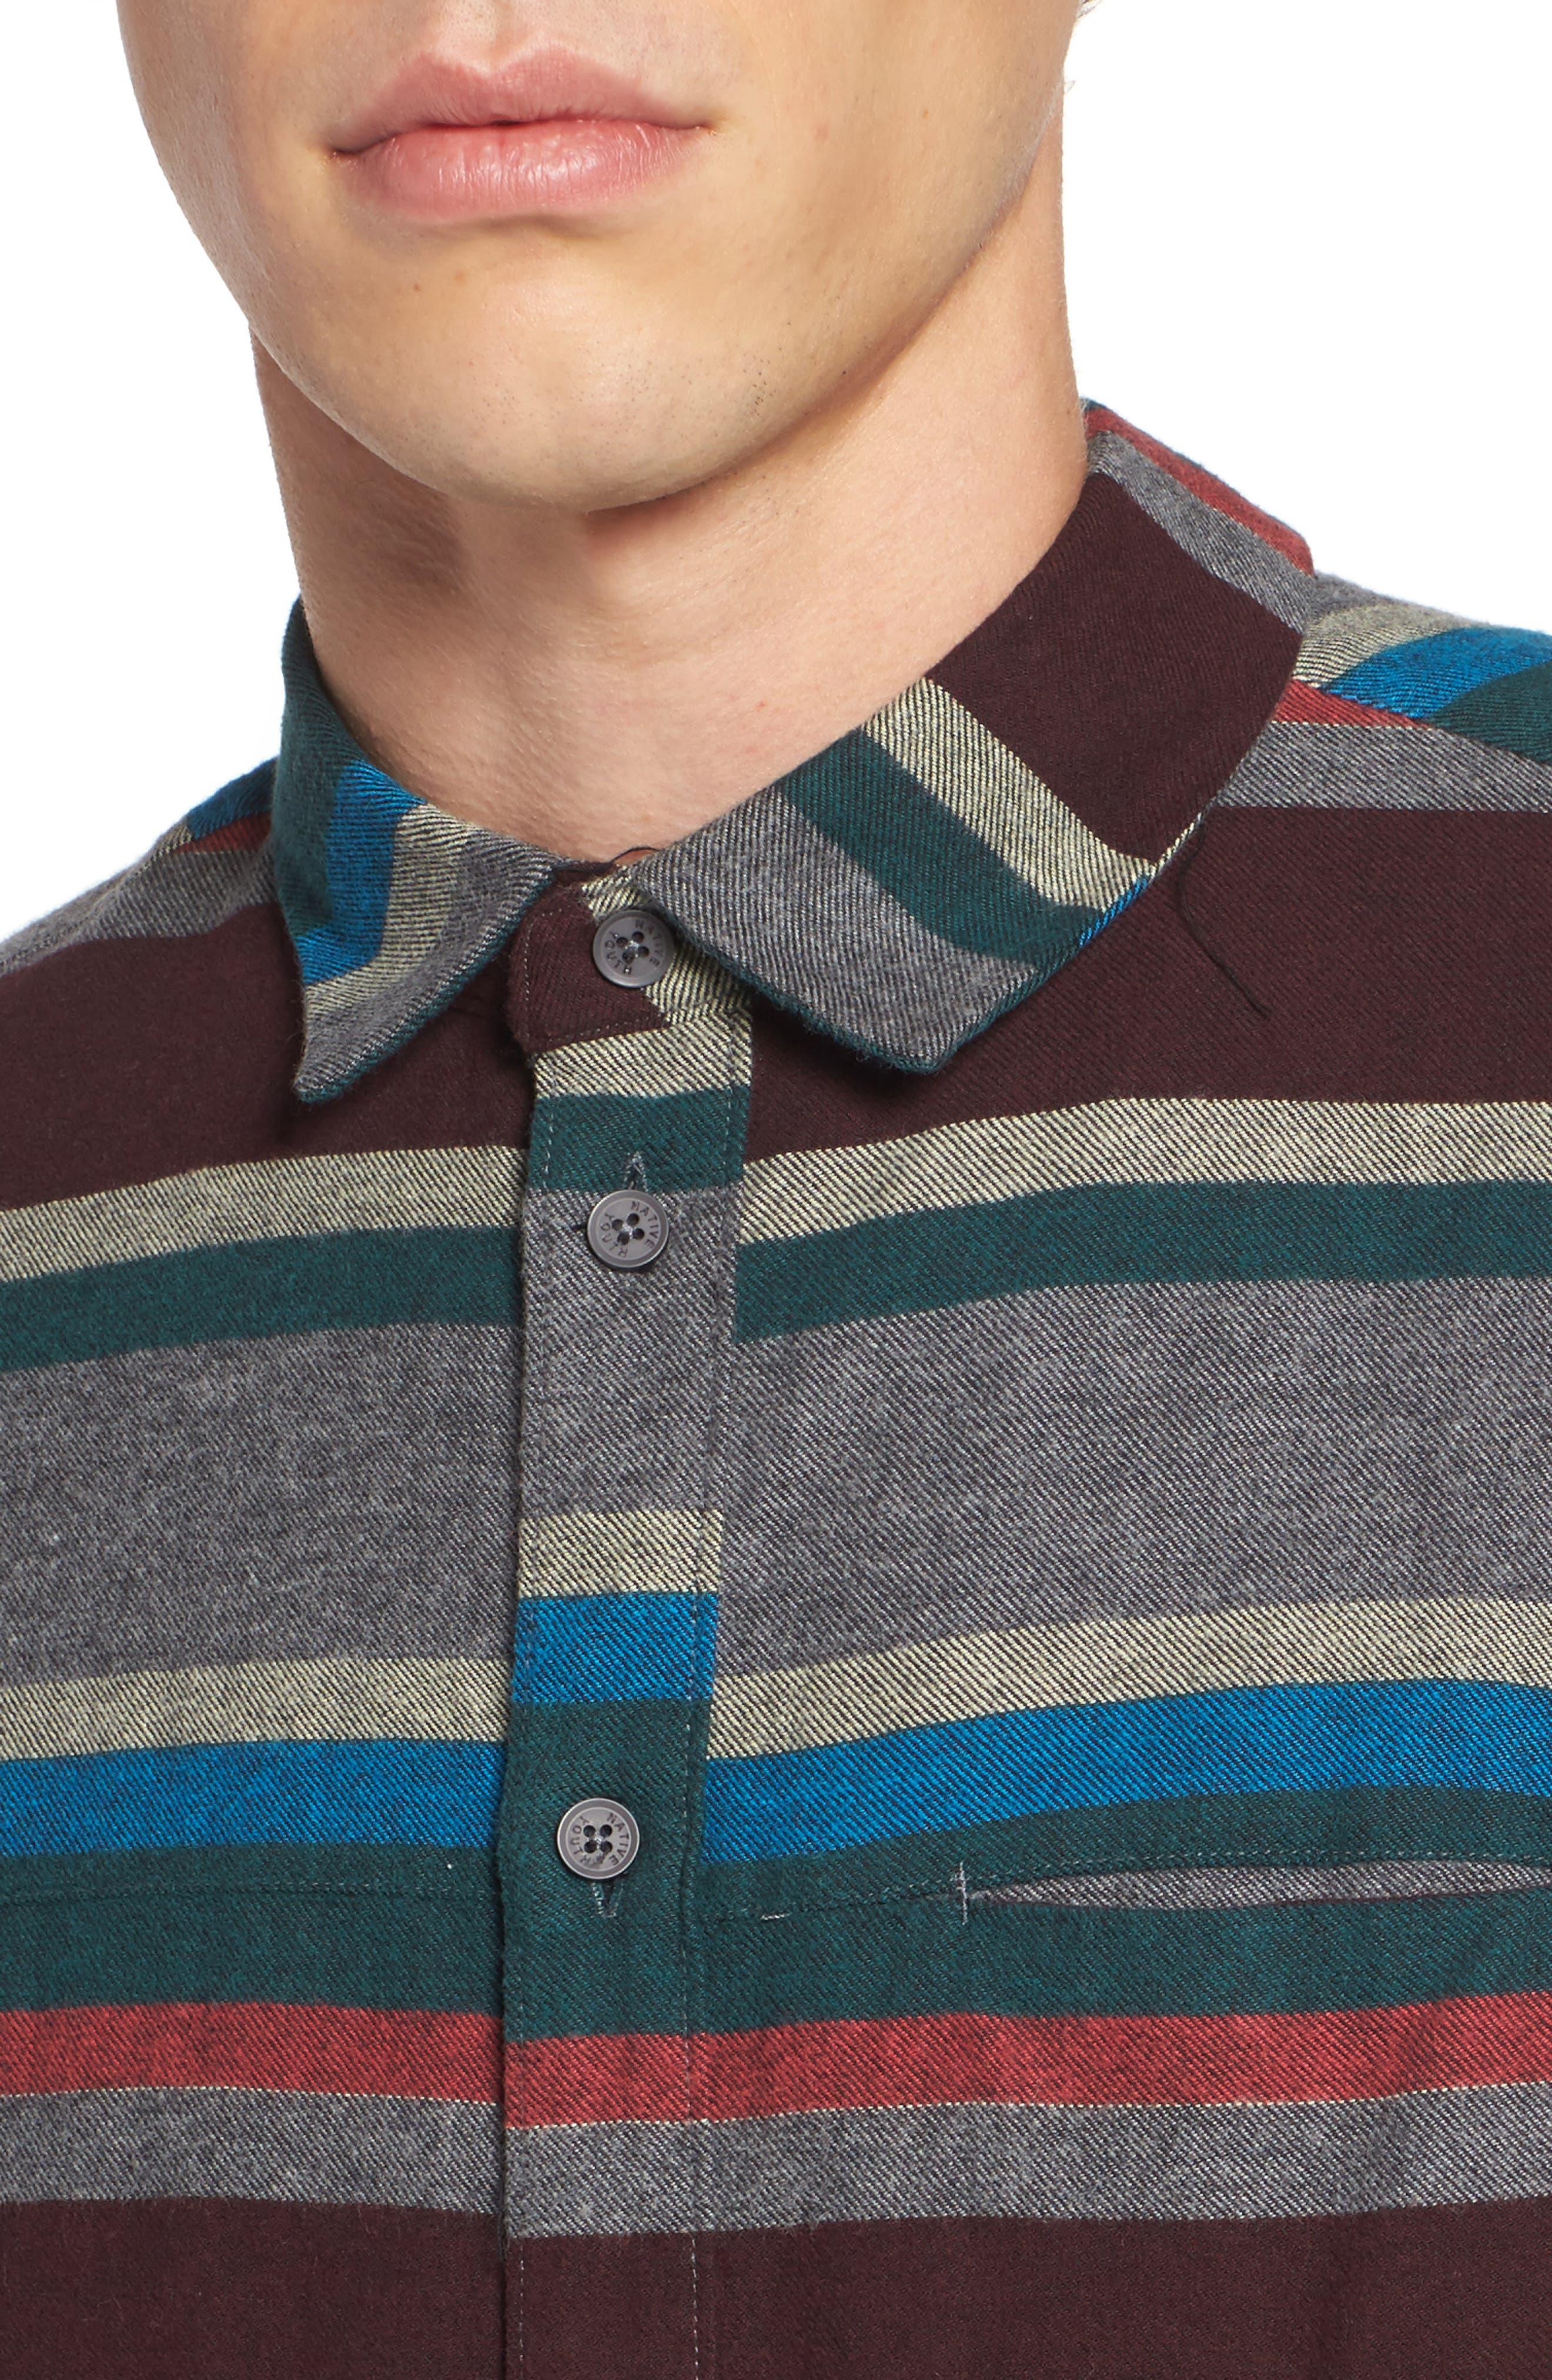 Arcot Woven Shirt,                             Alternate thumbnail 4, color,                             020